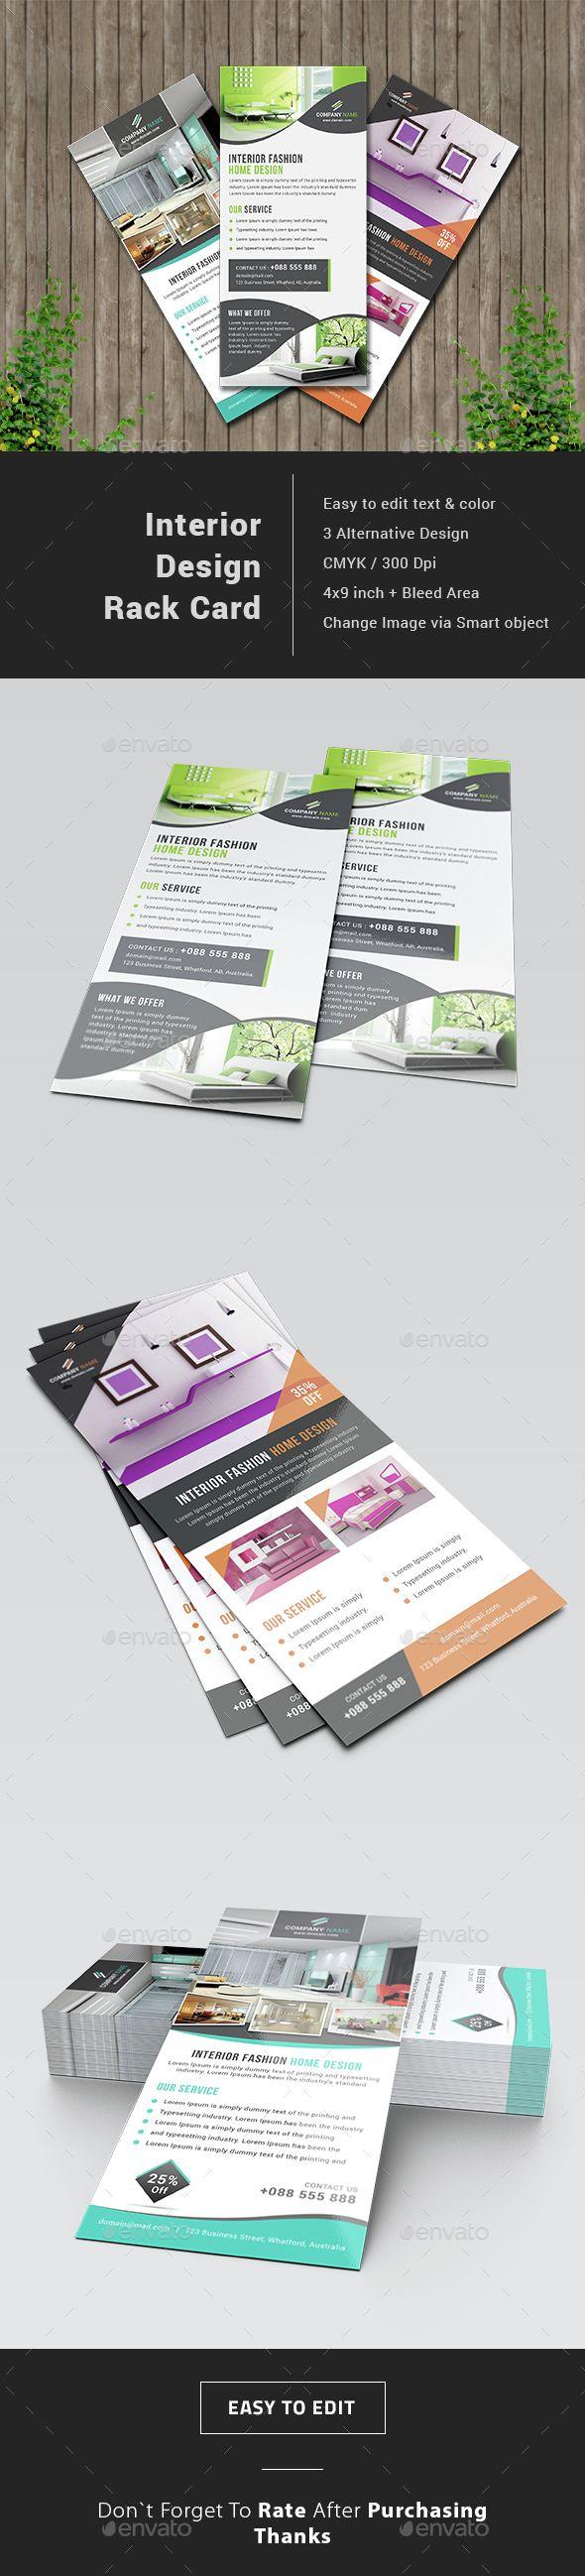 Interior Design Rack Card